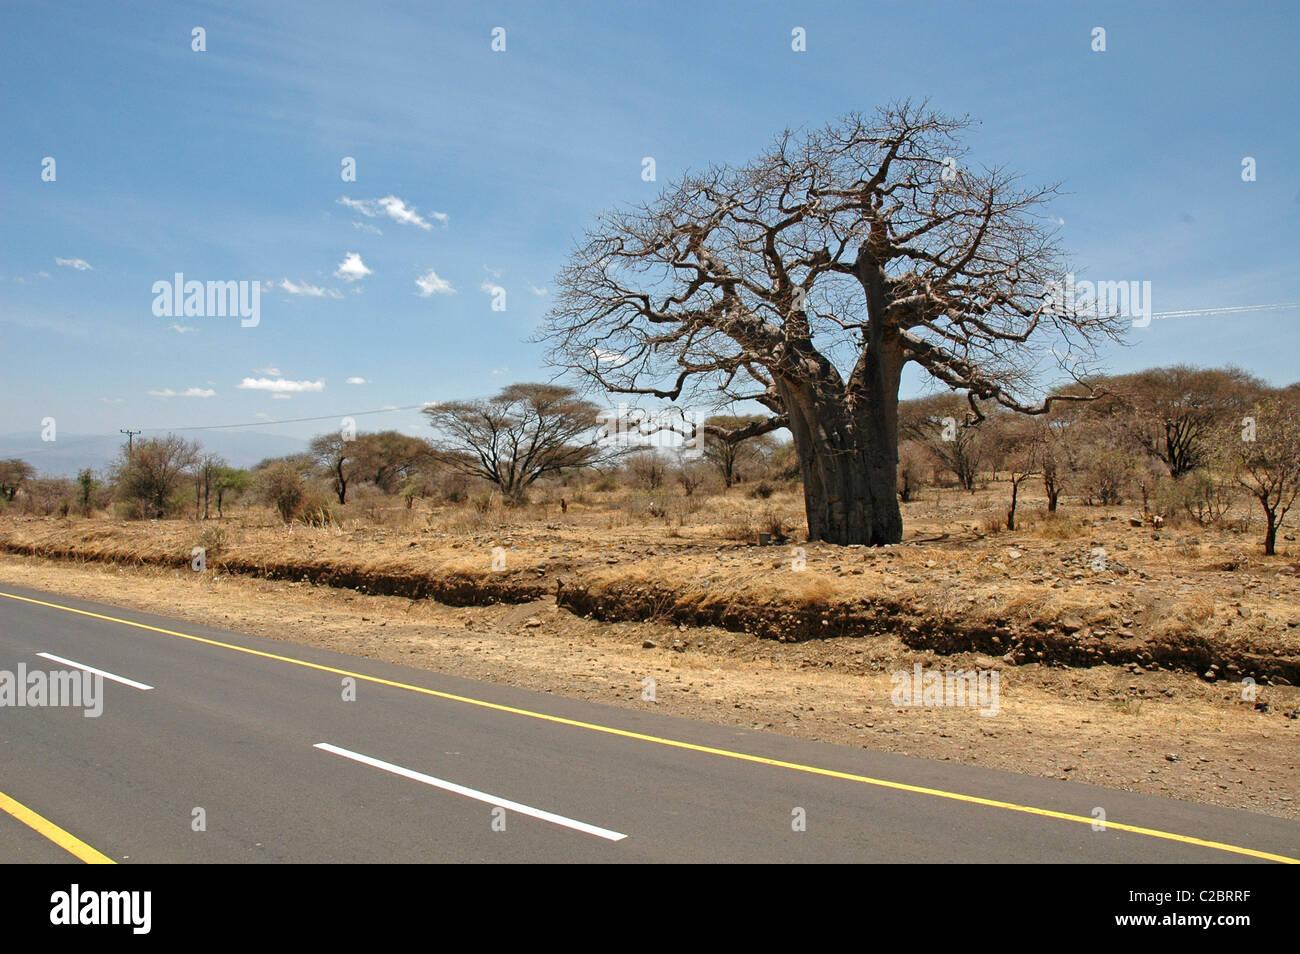 Baobab (Adansonia digitata),kenya,africa - Stock Image